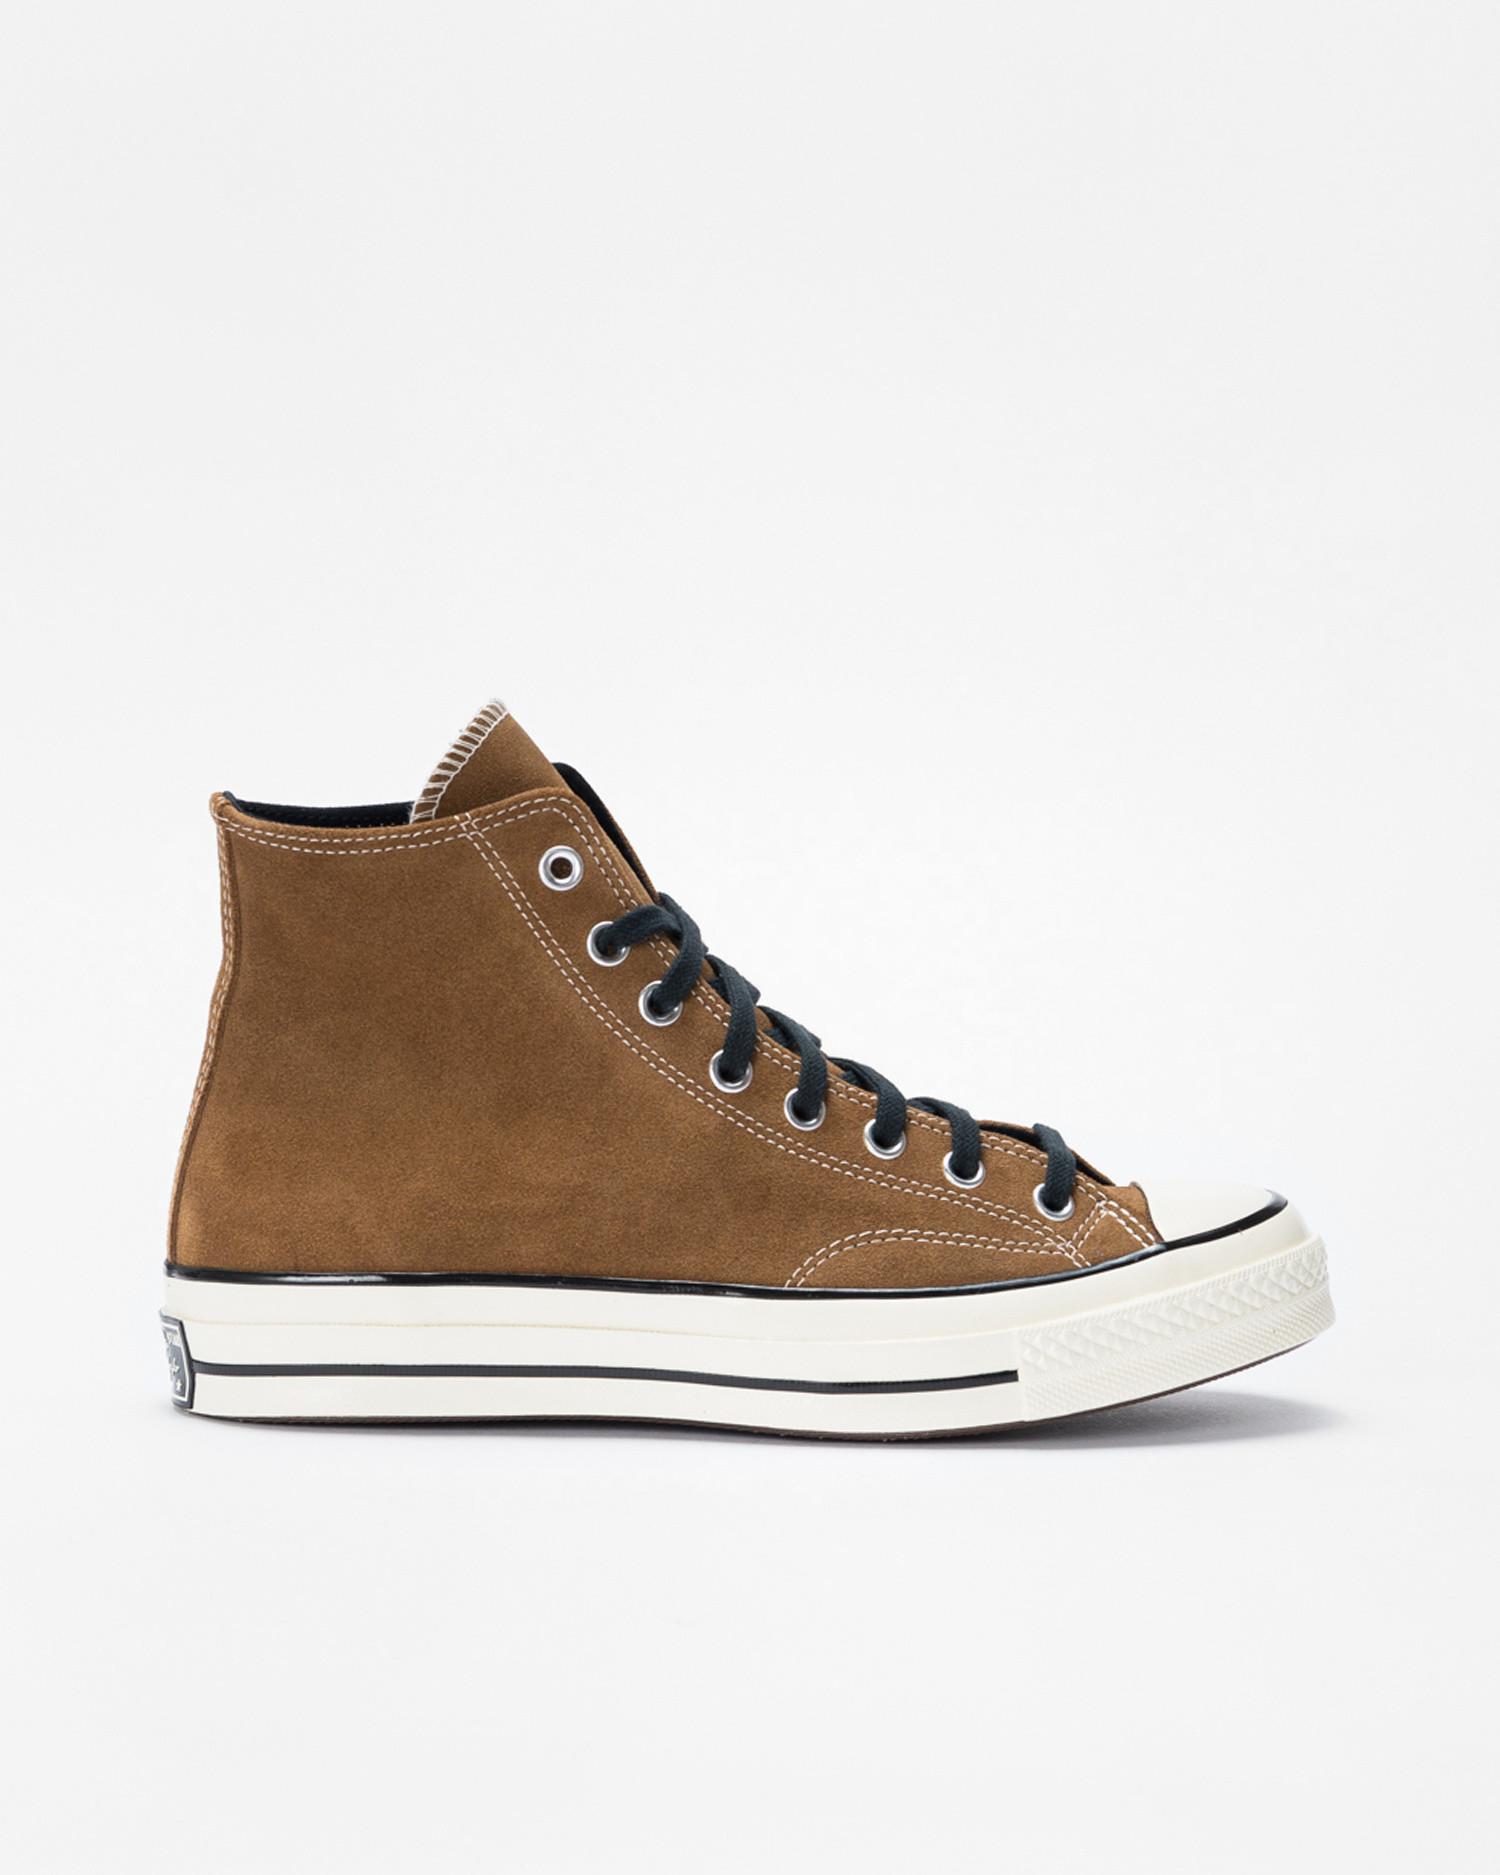 Converse Chuck 70 Hi Suede Clove Brown/Black/Egret